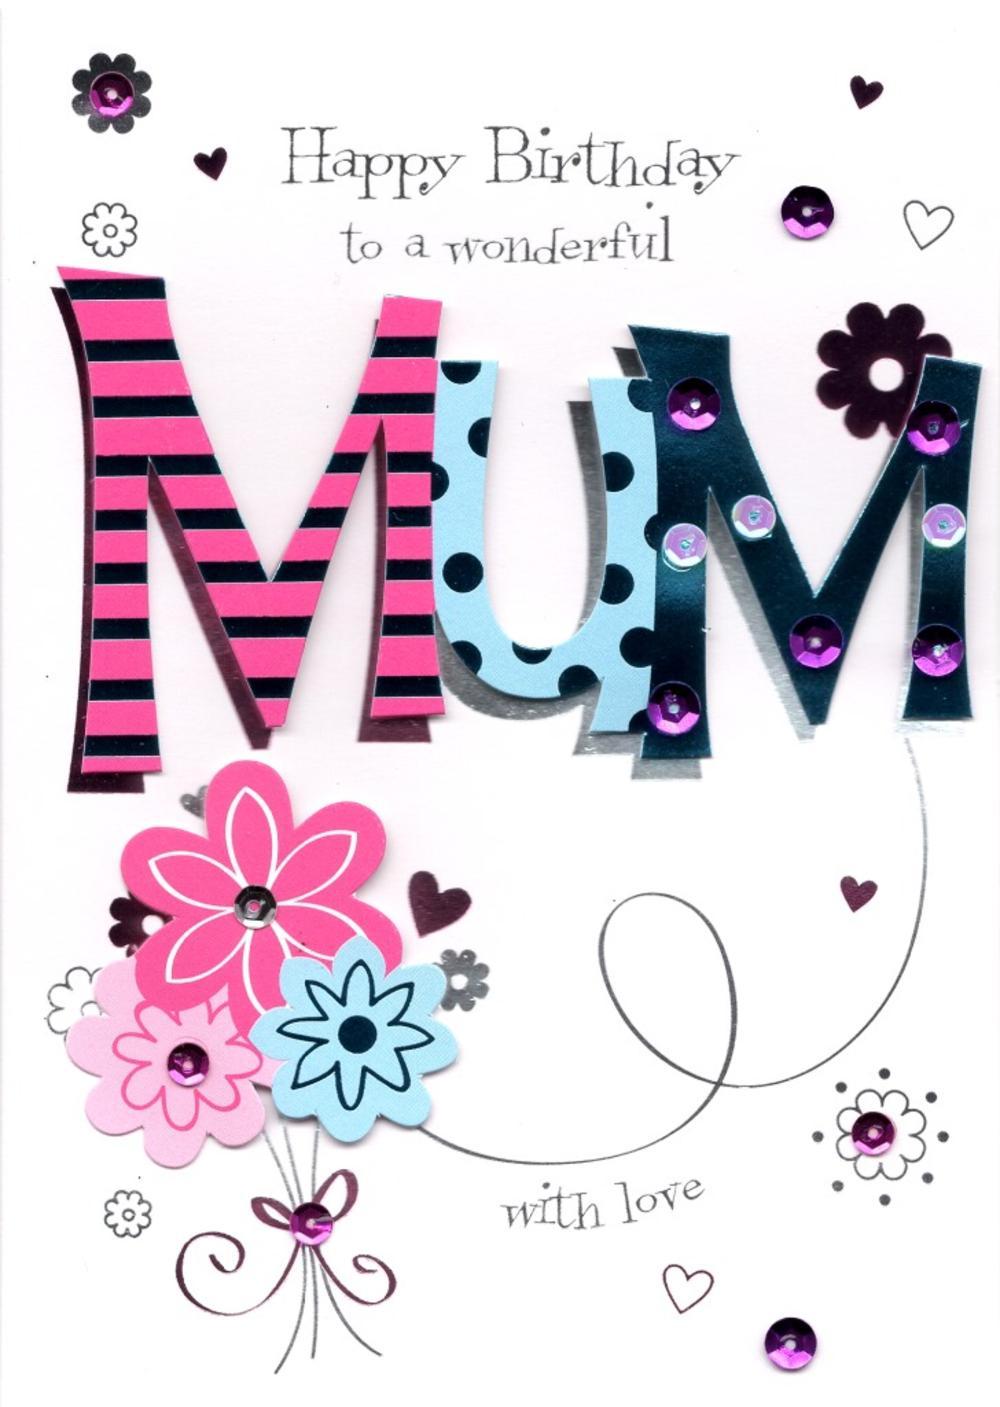 Wonderful Mum Handmade Birthday Greeting Card Cards – Mum 65th Birthday Card